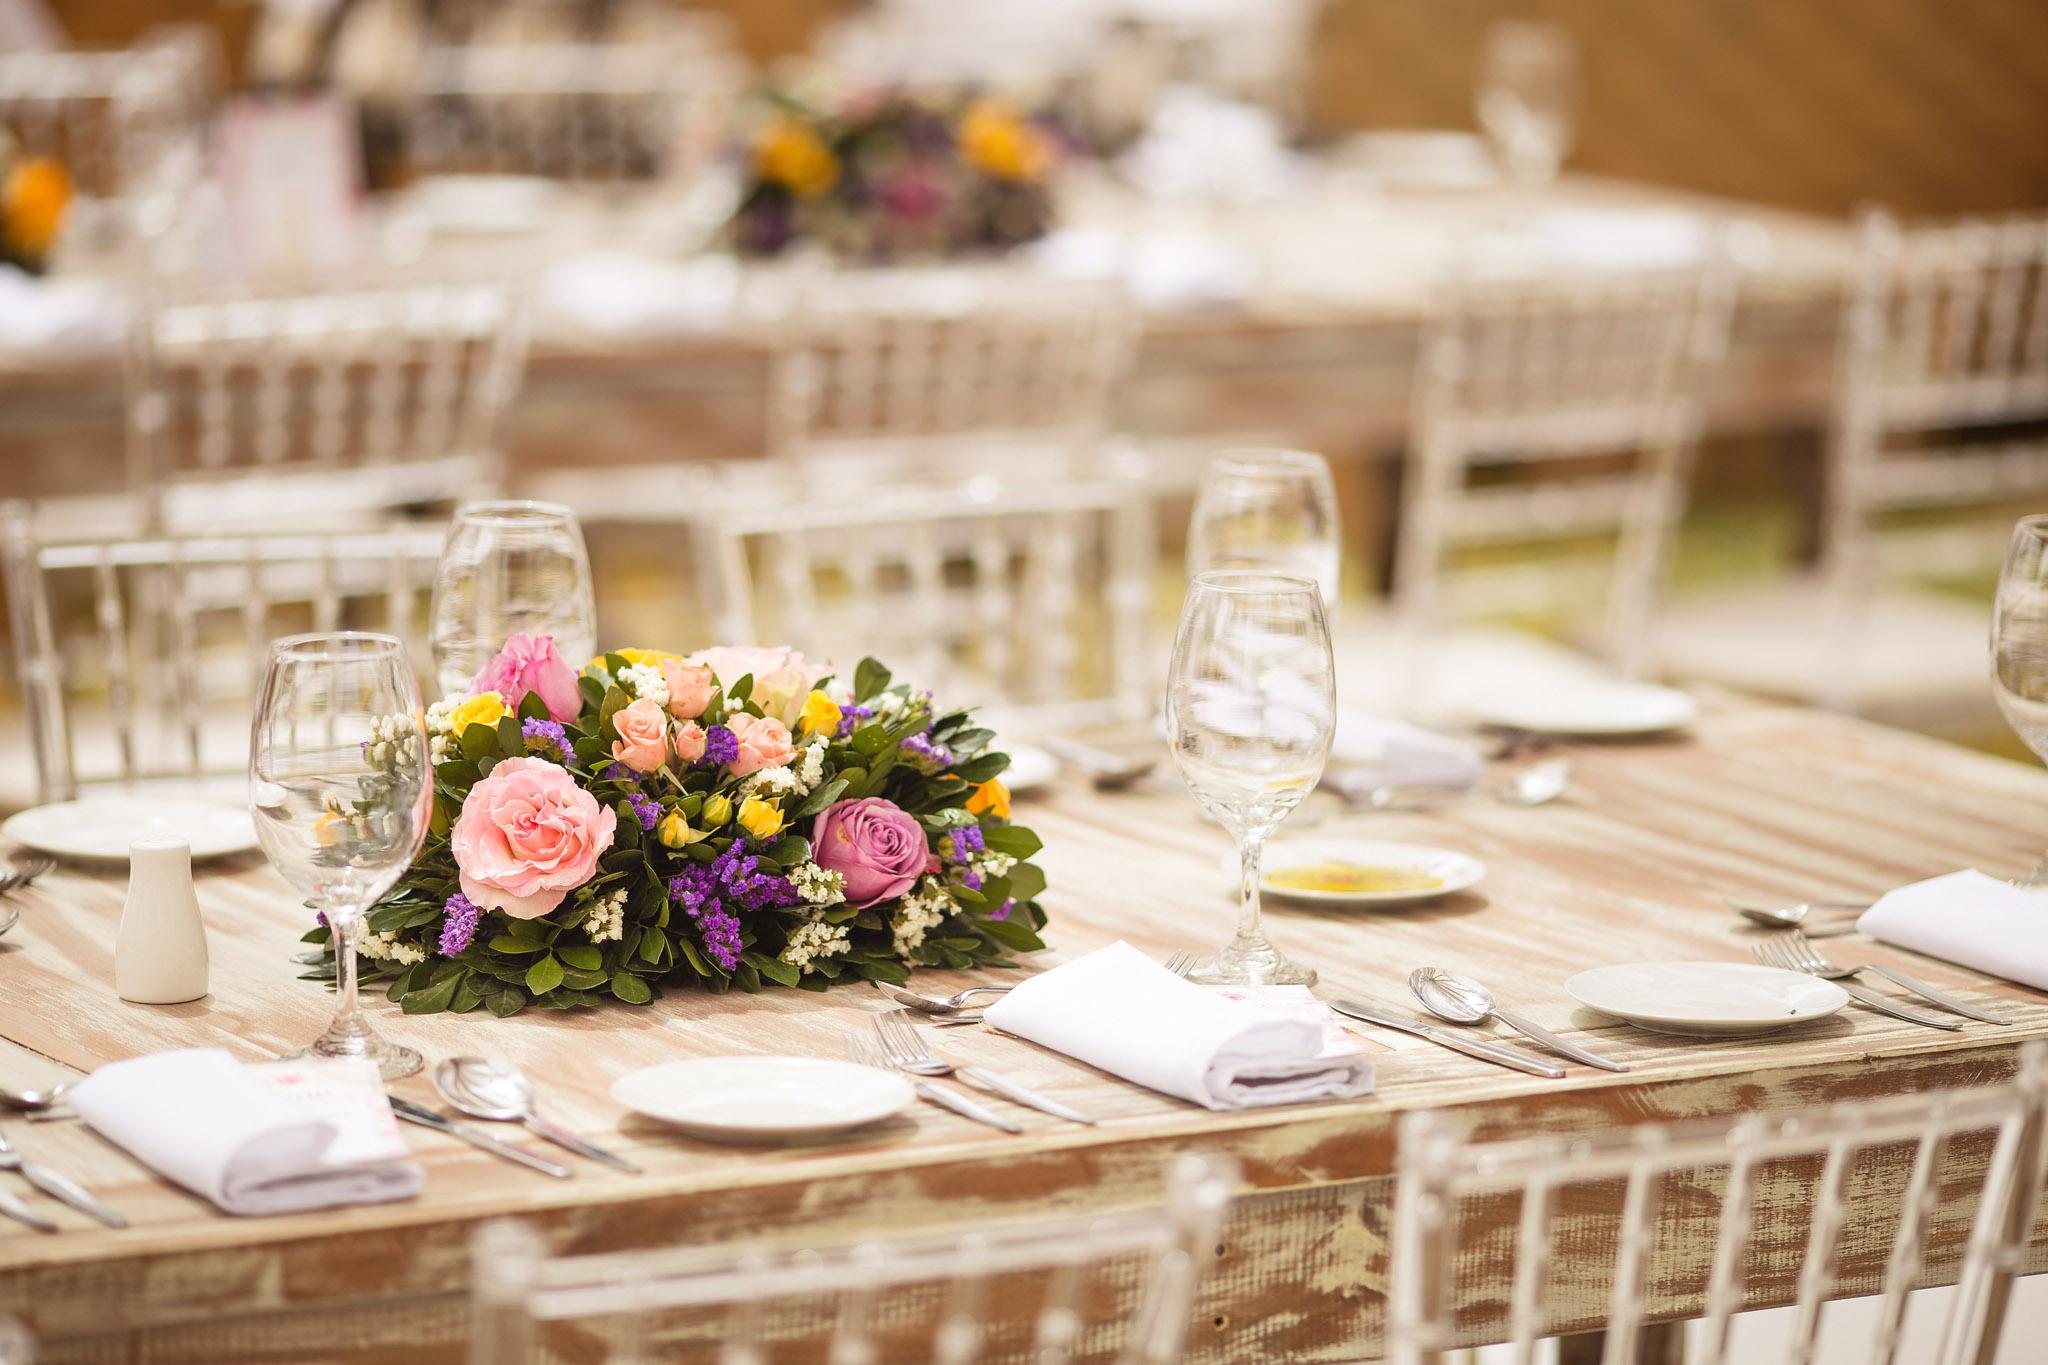 Wedding-Travellers-Destination-Wedding-Peru-Cusco-Hacienda-Sarapampa-Sacred-Valley-flower-colorful-wood-table-decoration